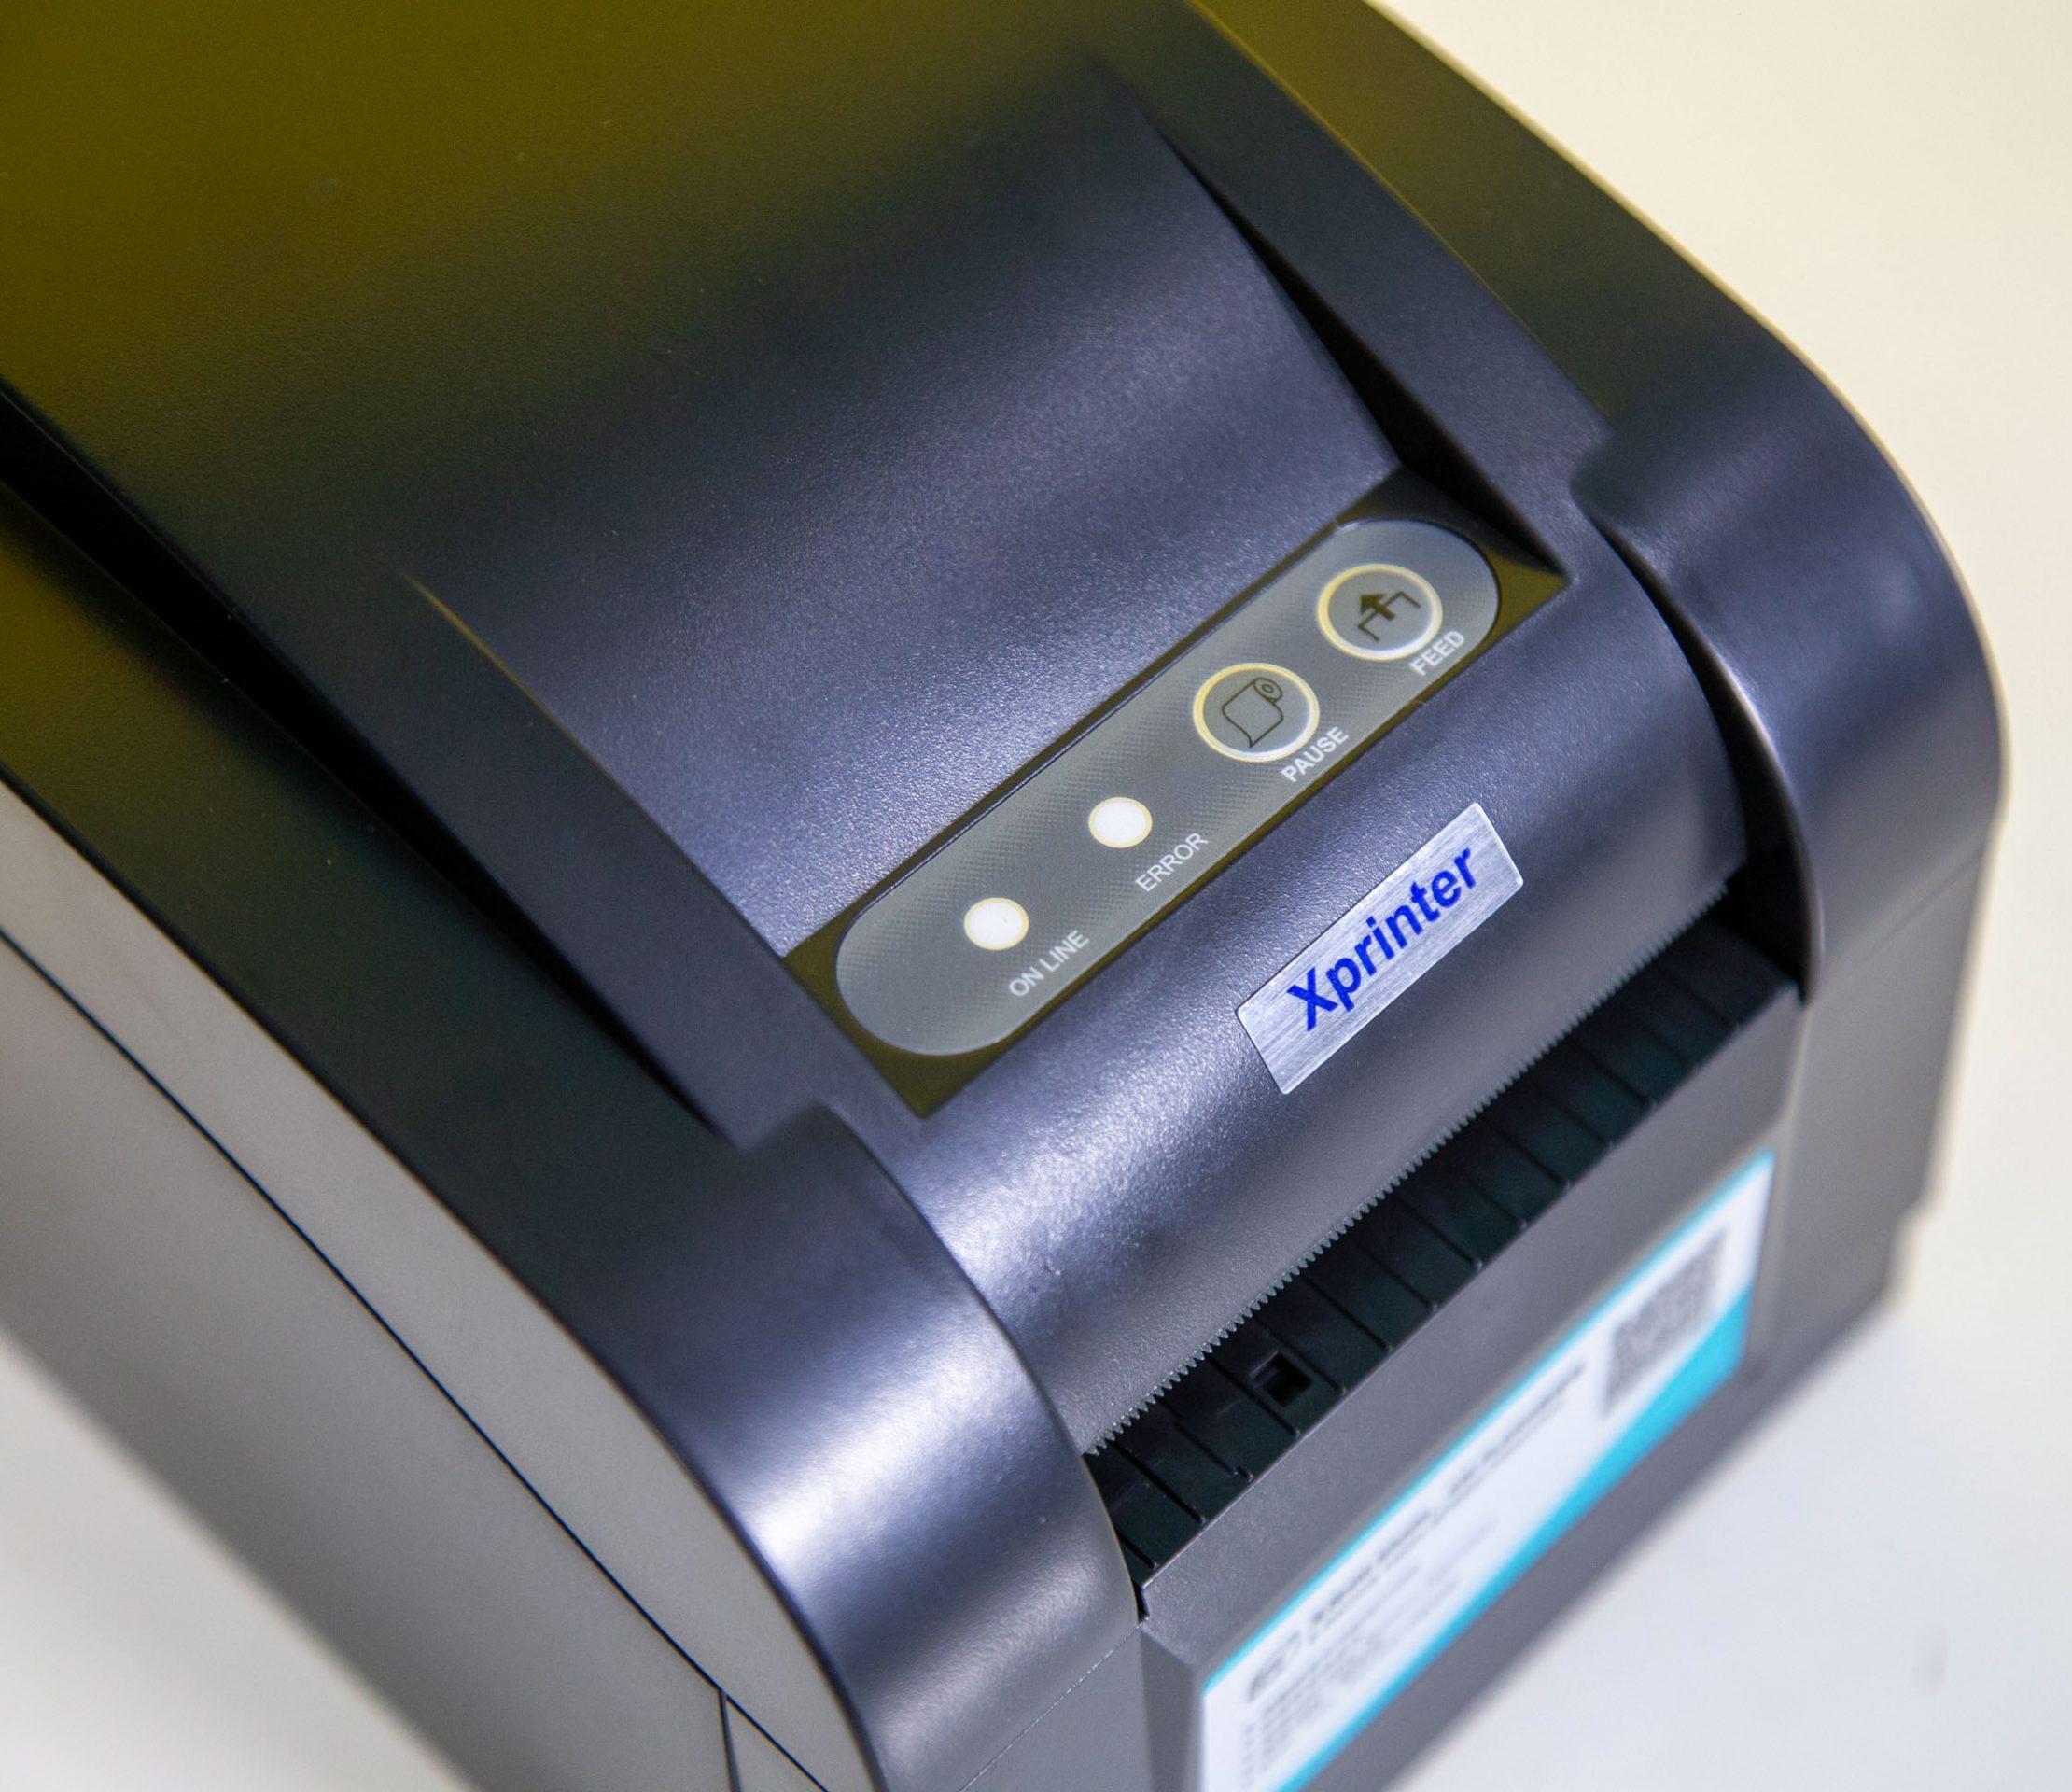 may in tem nhan ma vach xprinter 350b hnc21 scaled e1625415449766